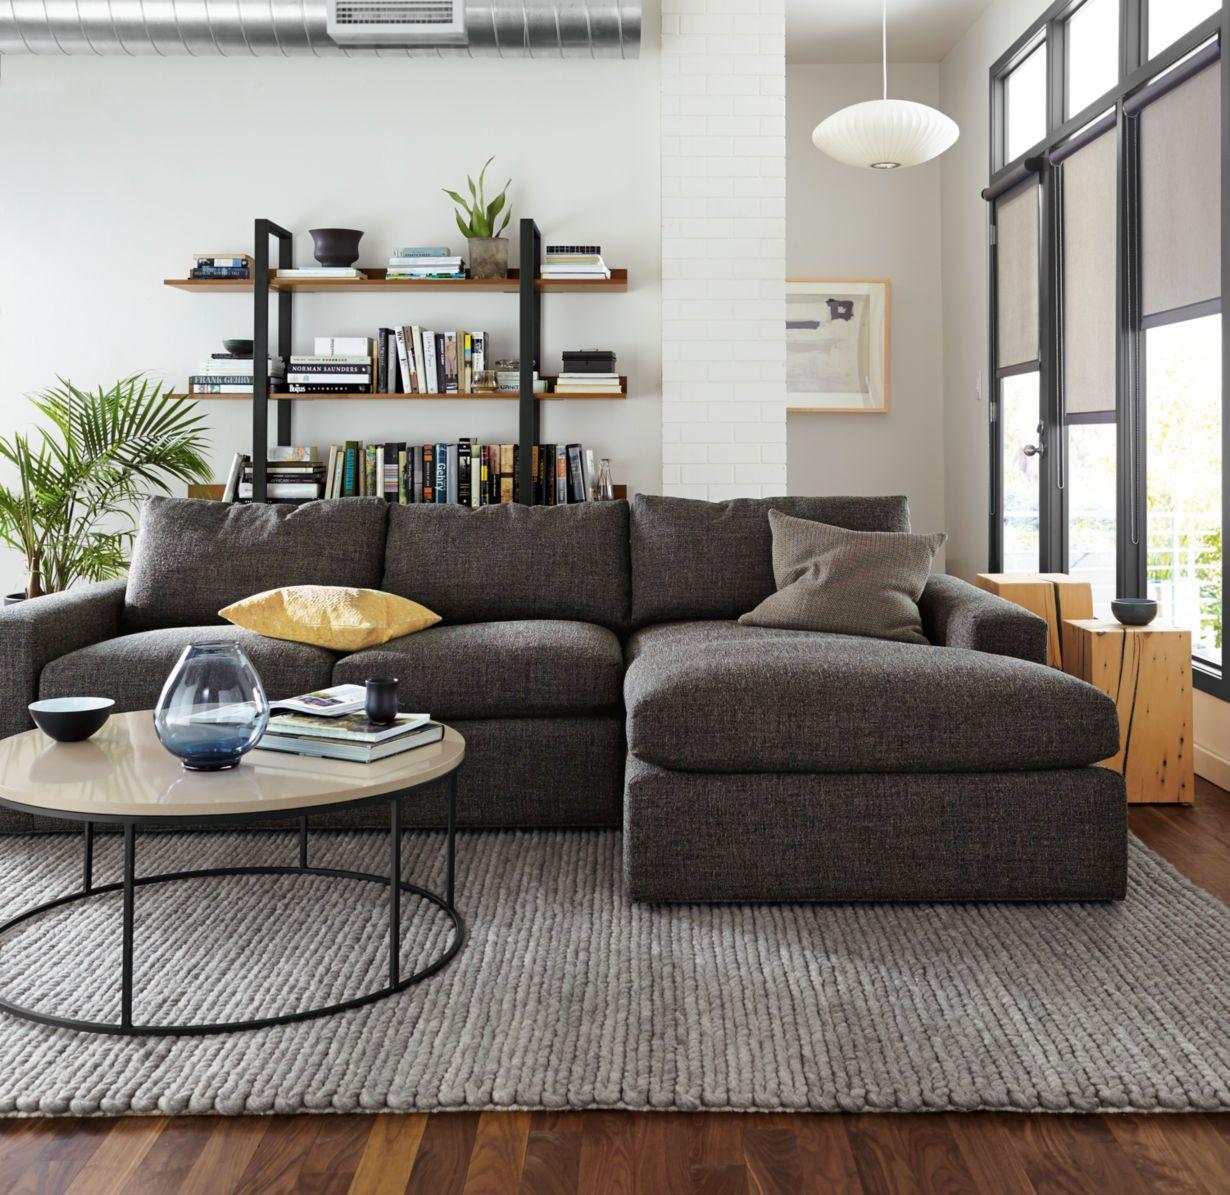 Elton modern bookcase modern bookcases shelves modern office furniture room board